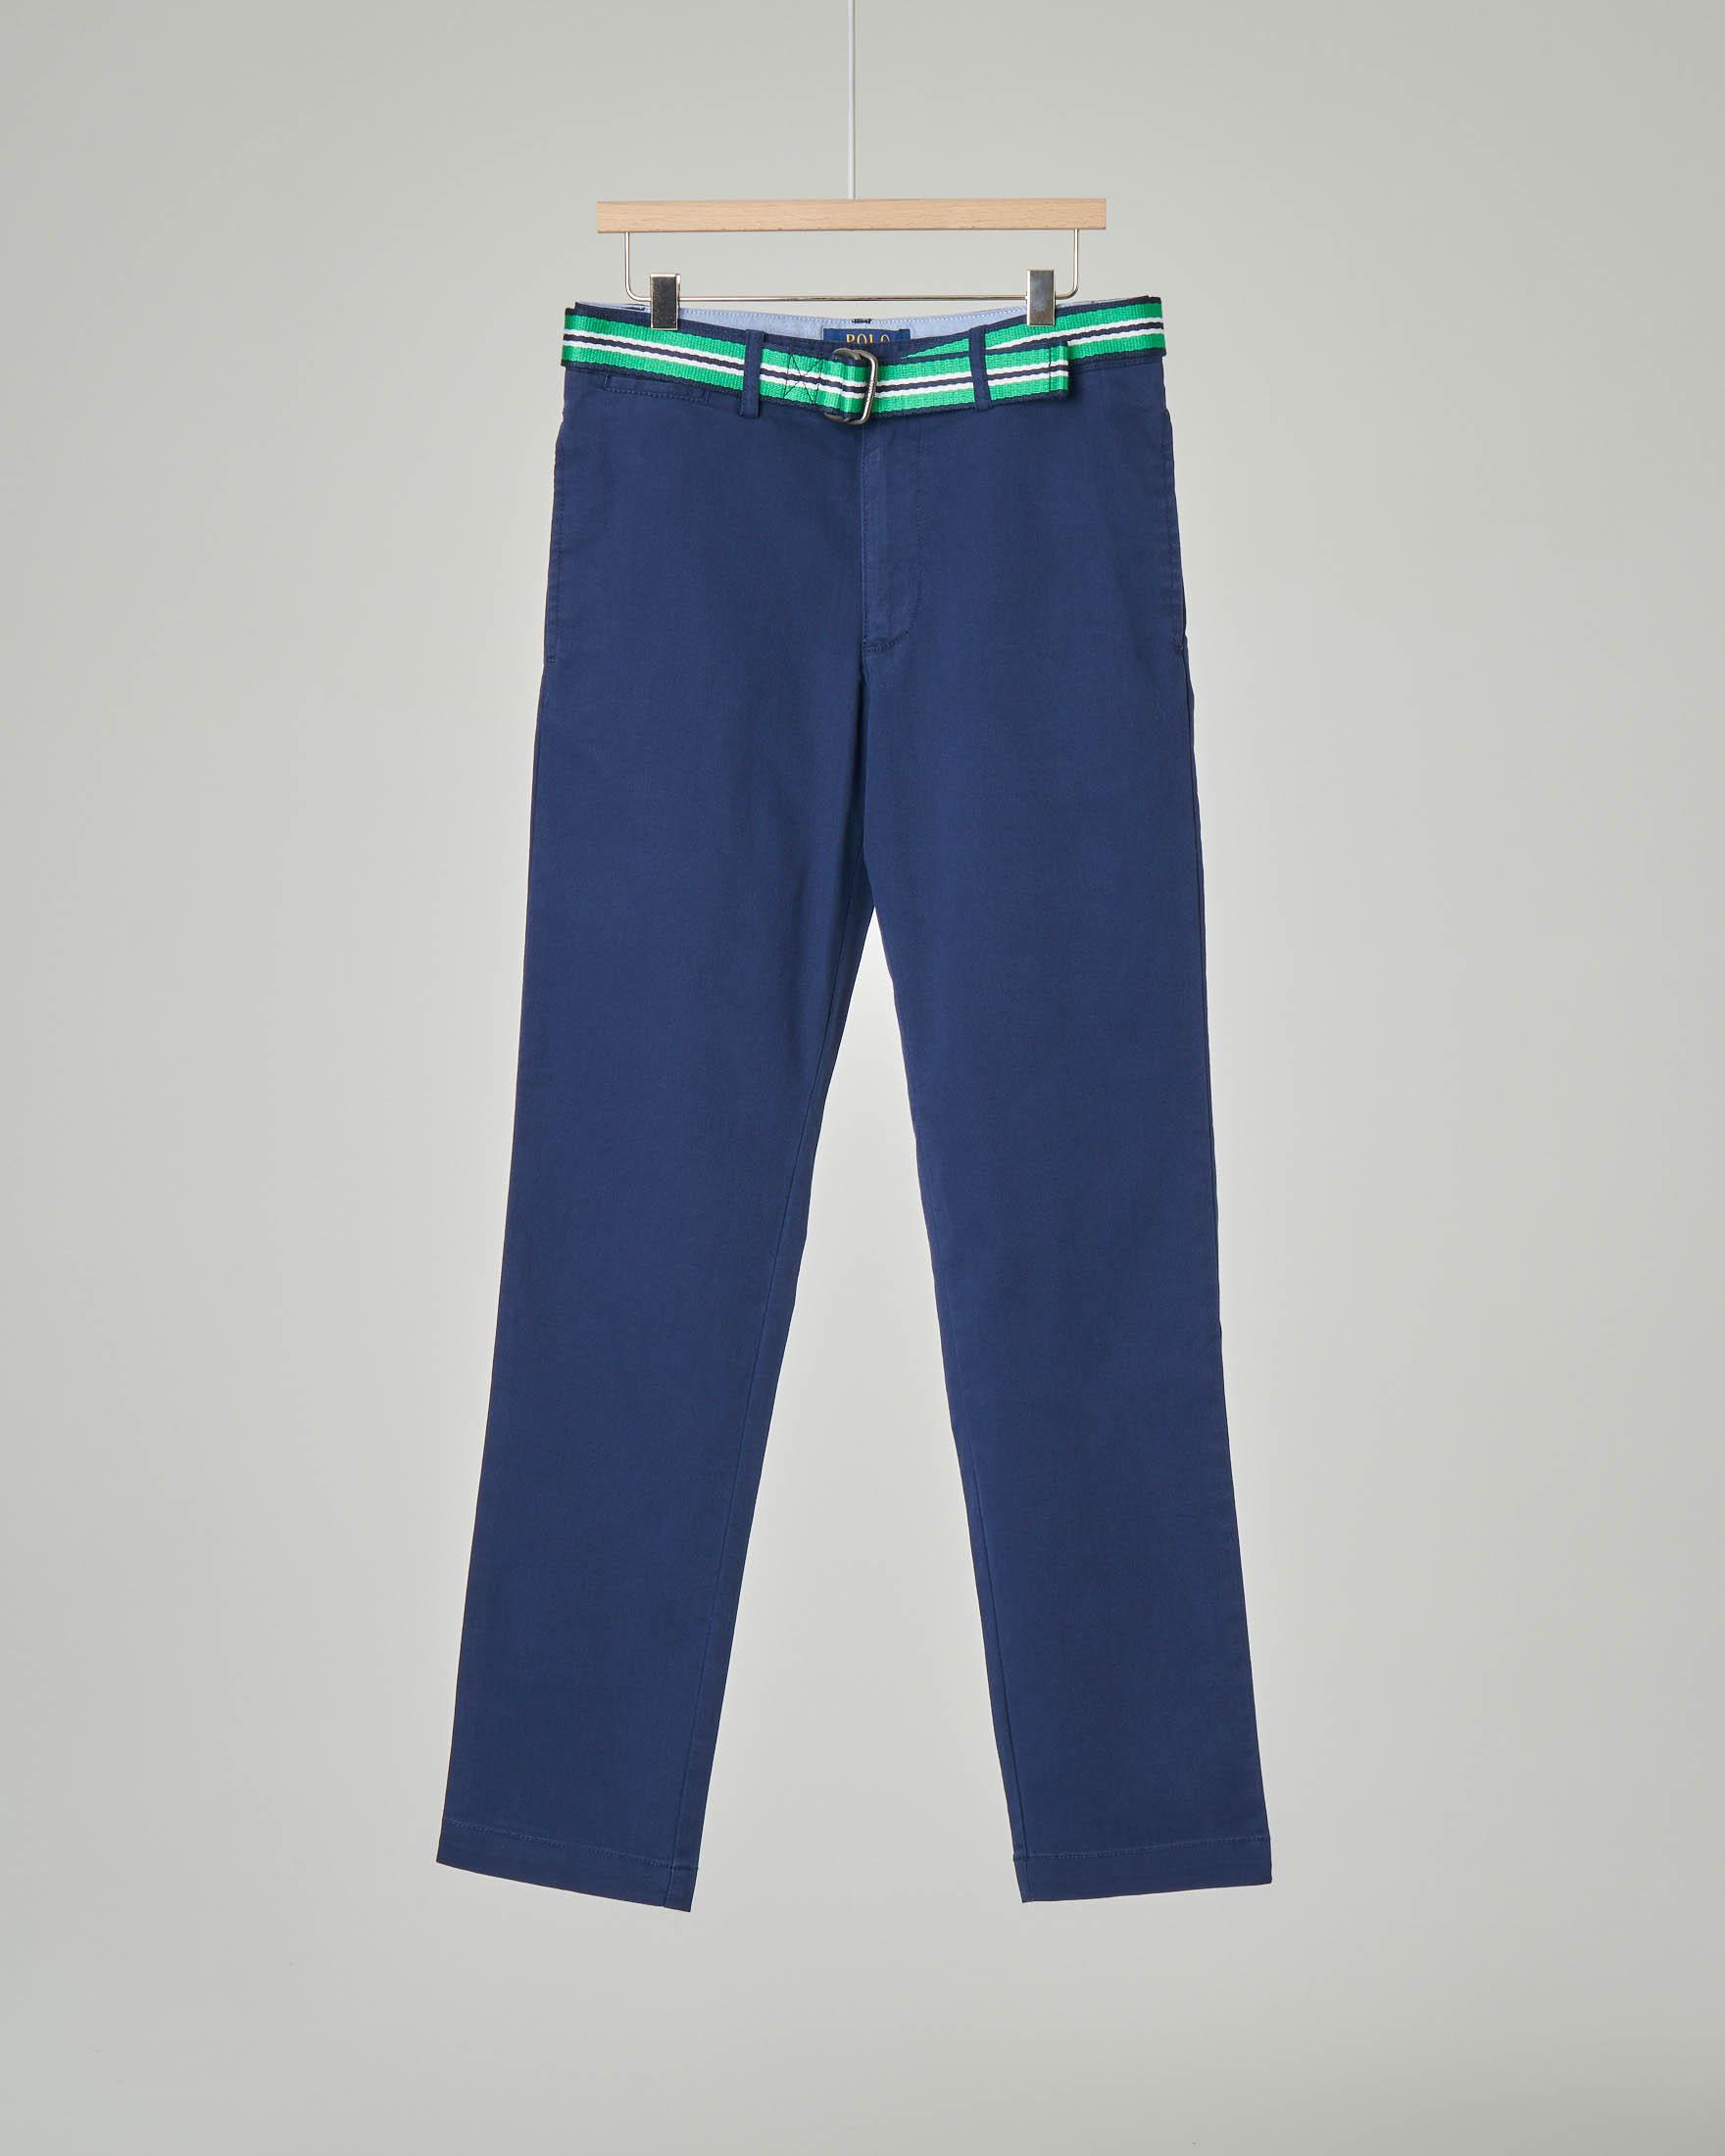 Pantalone chino blu con cintura